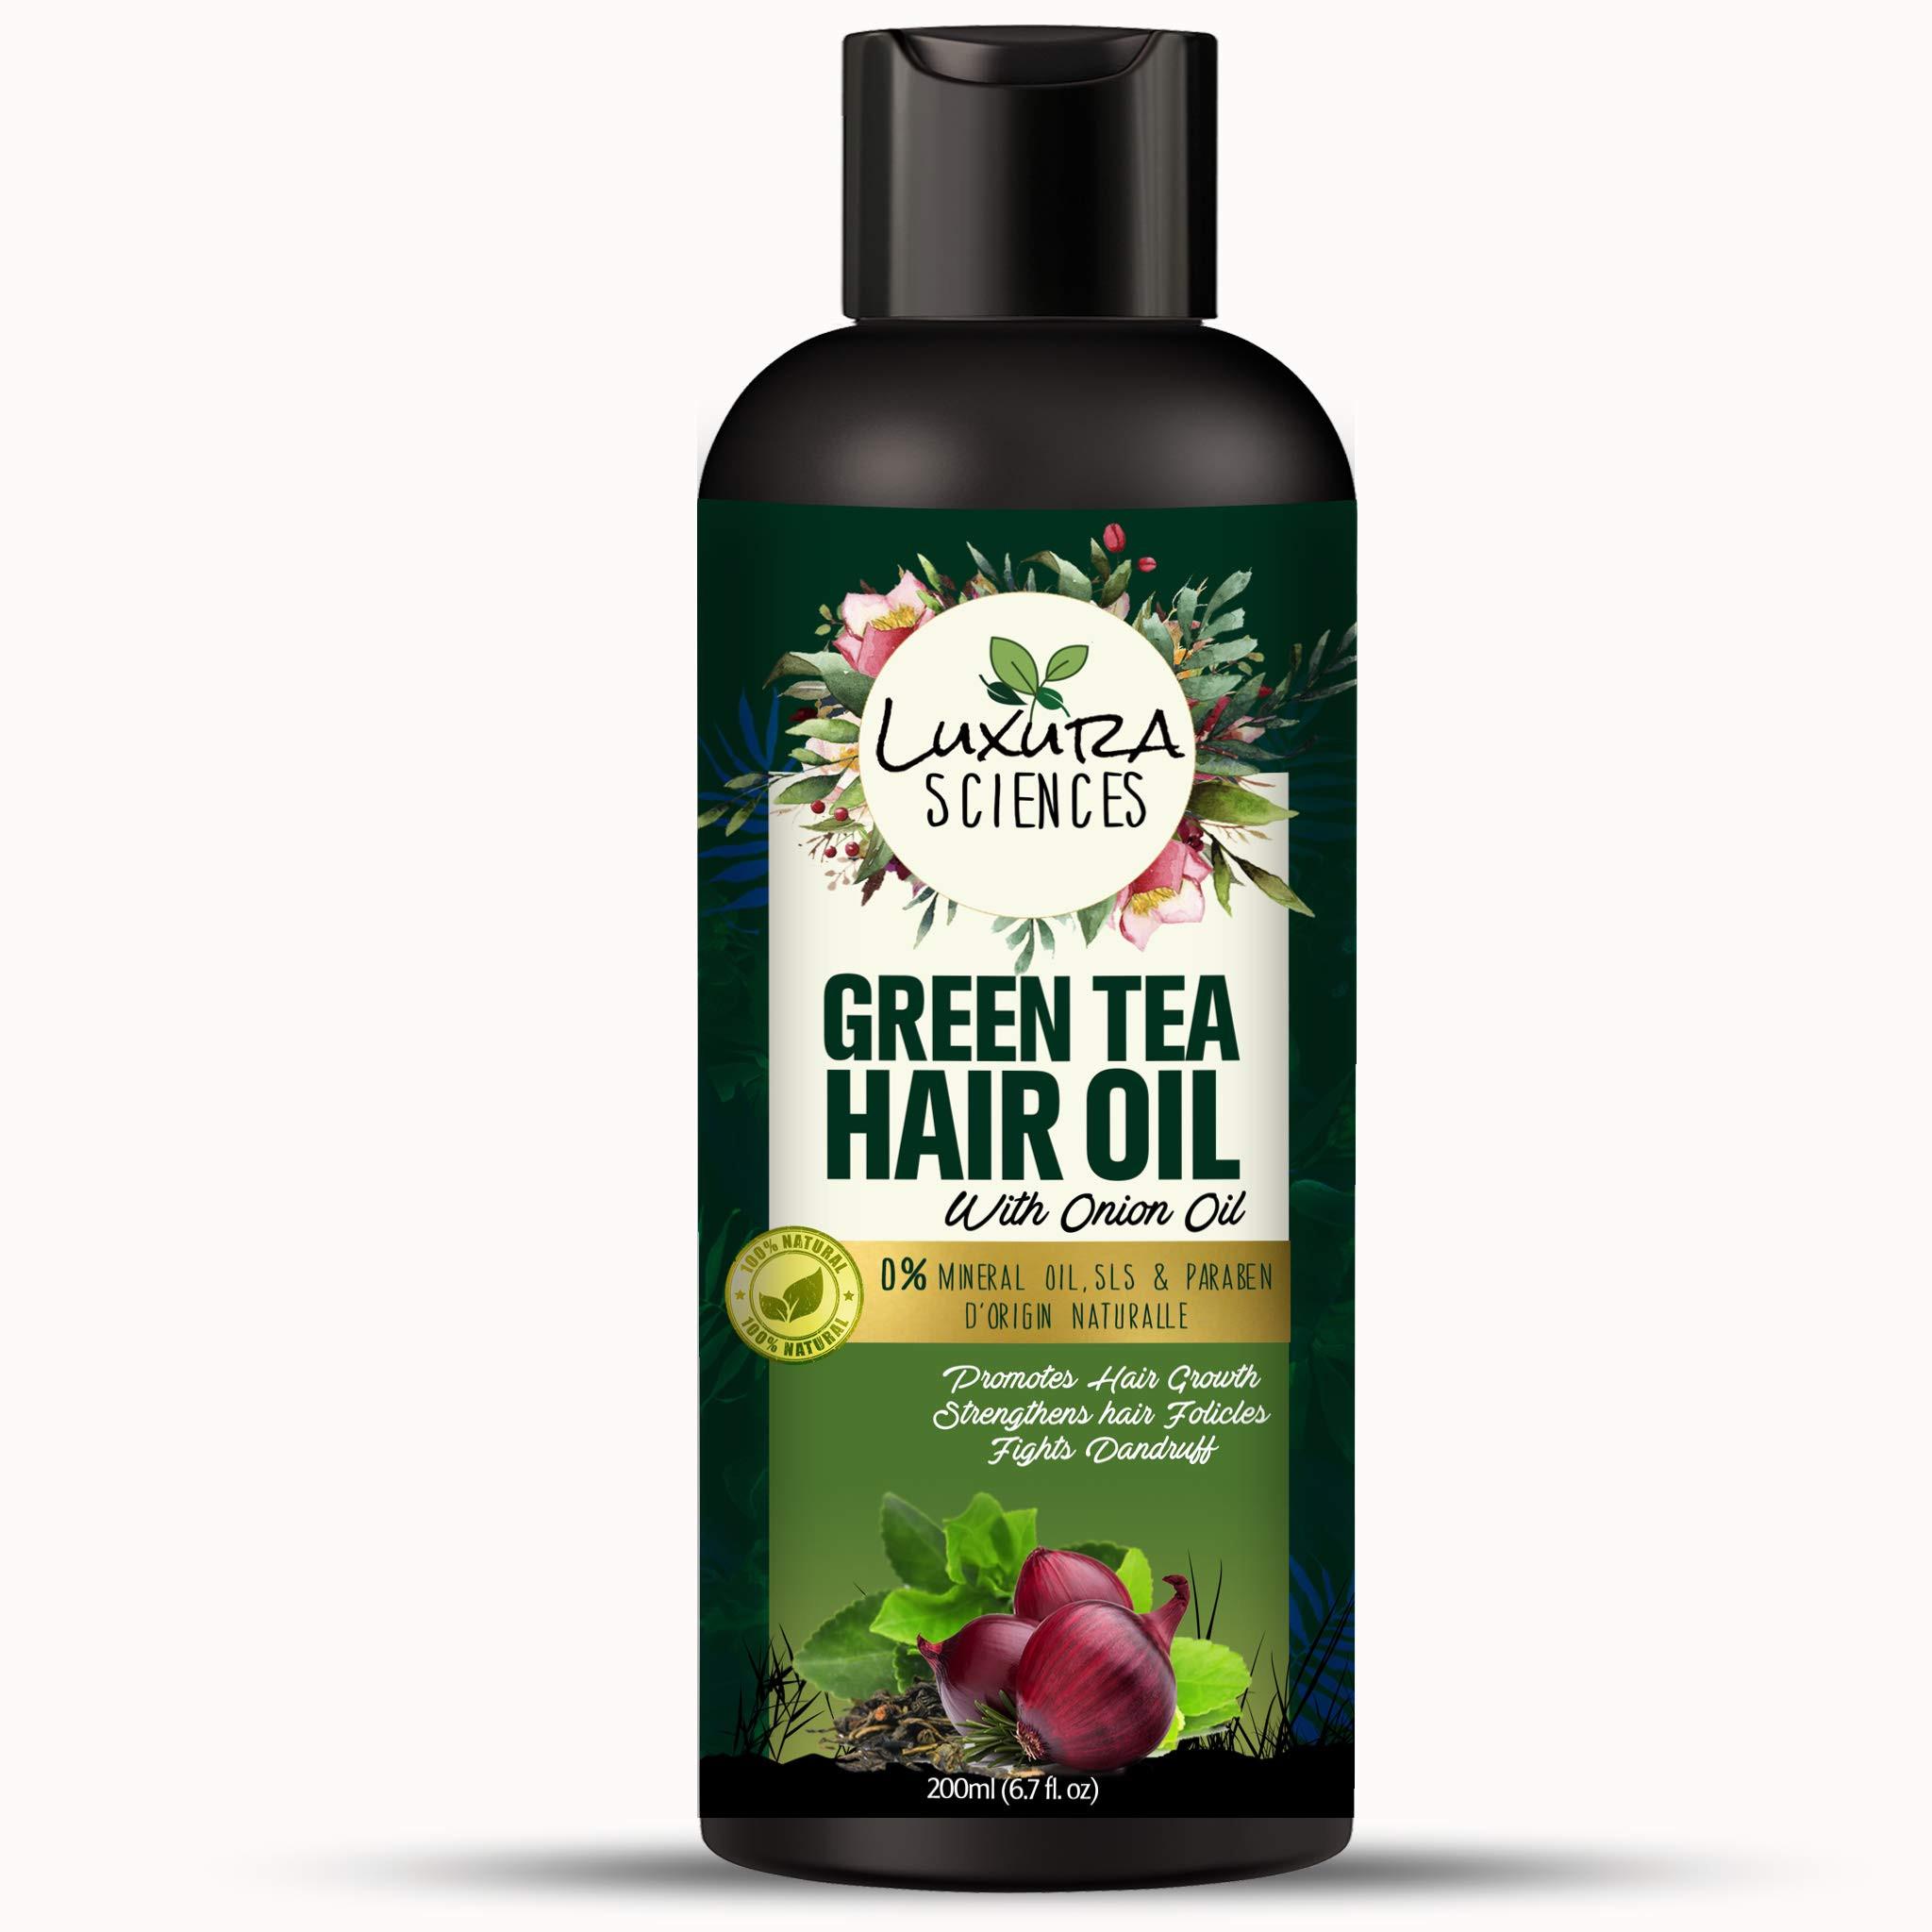 Luxura Sciences Green Tea Hair Oil with Onion Oil 200ml for Hair Improvement.